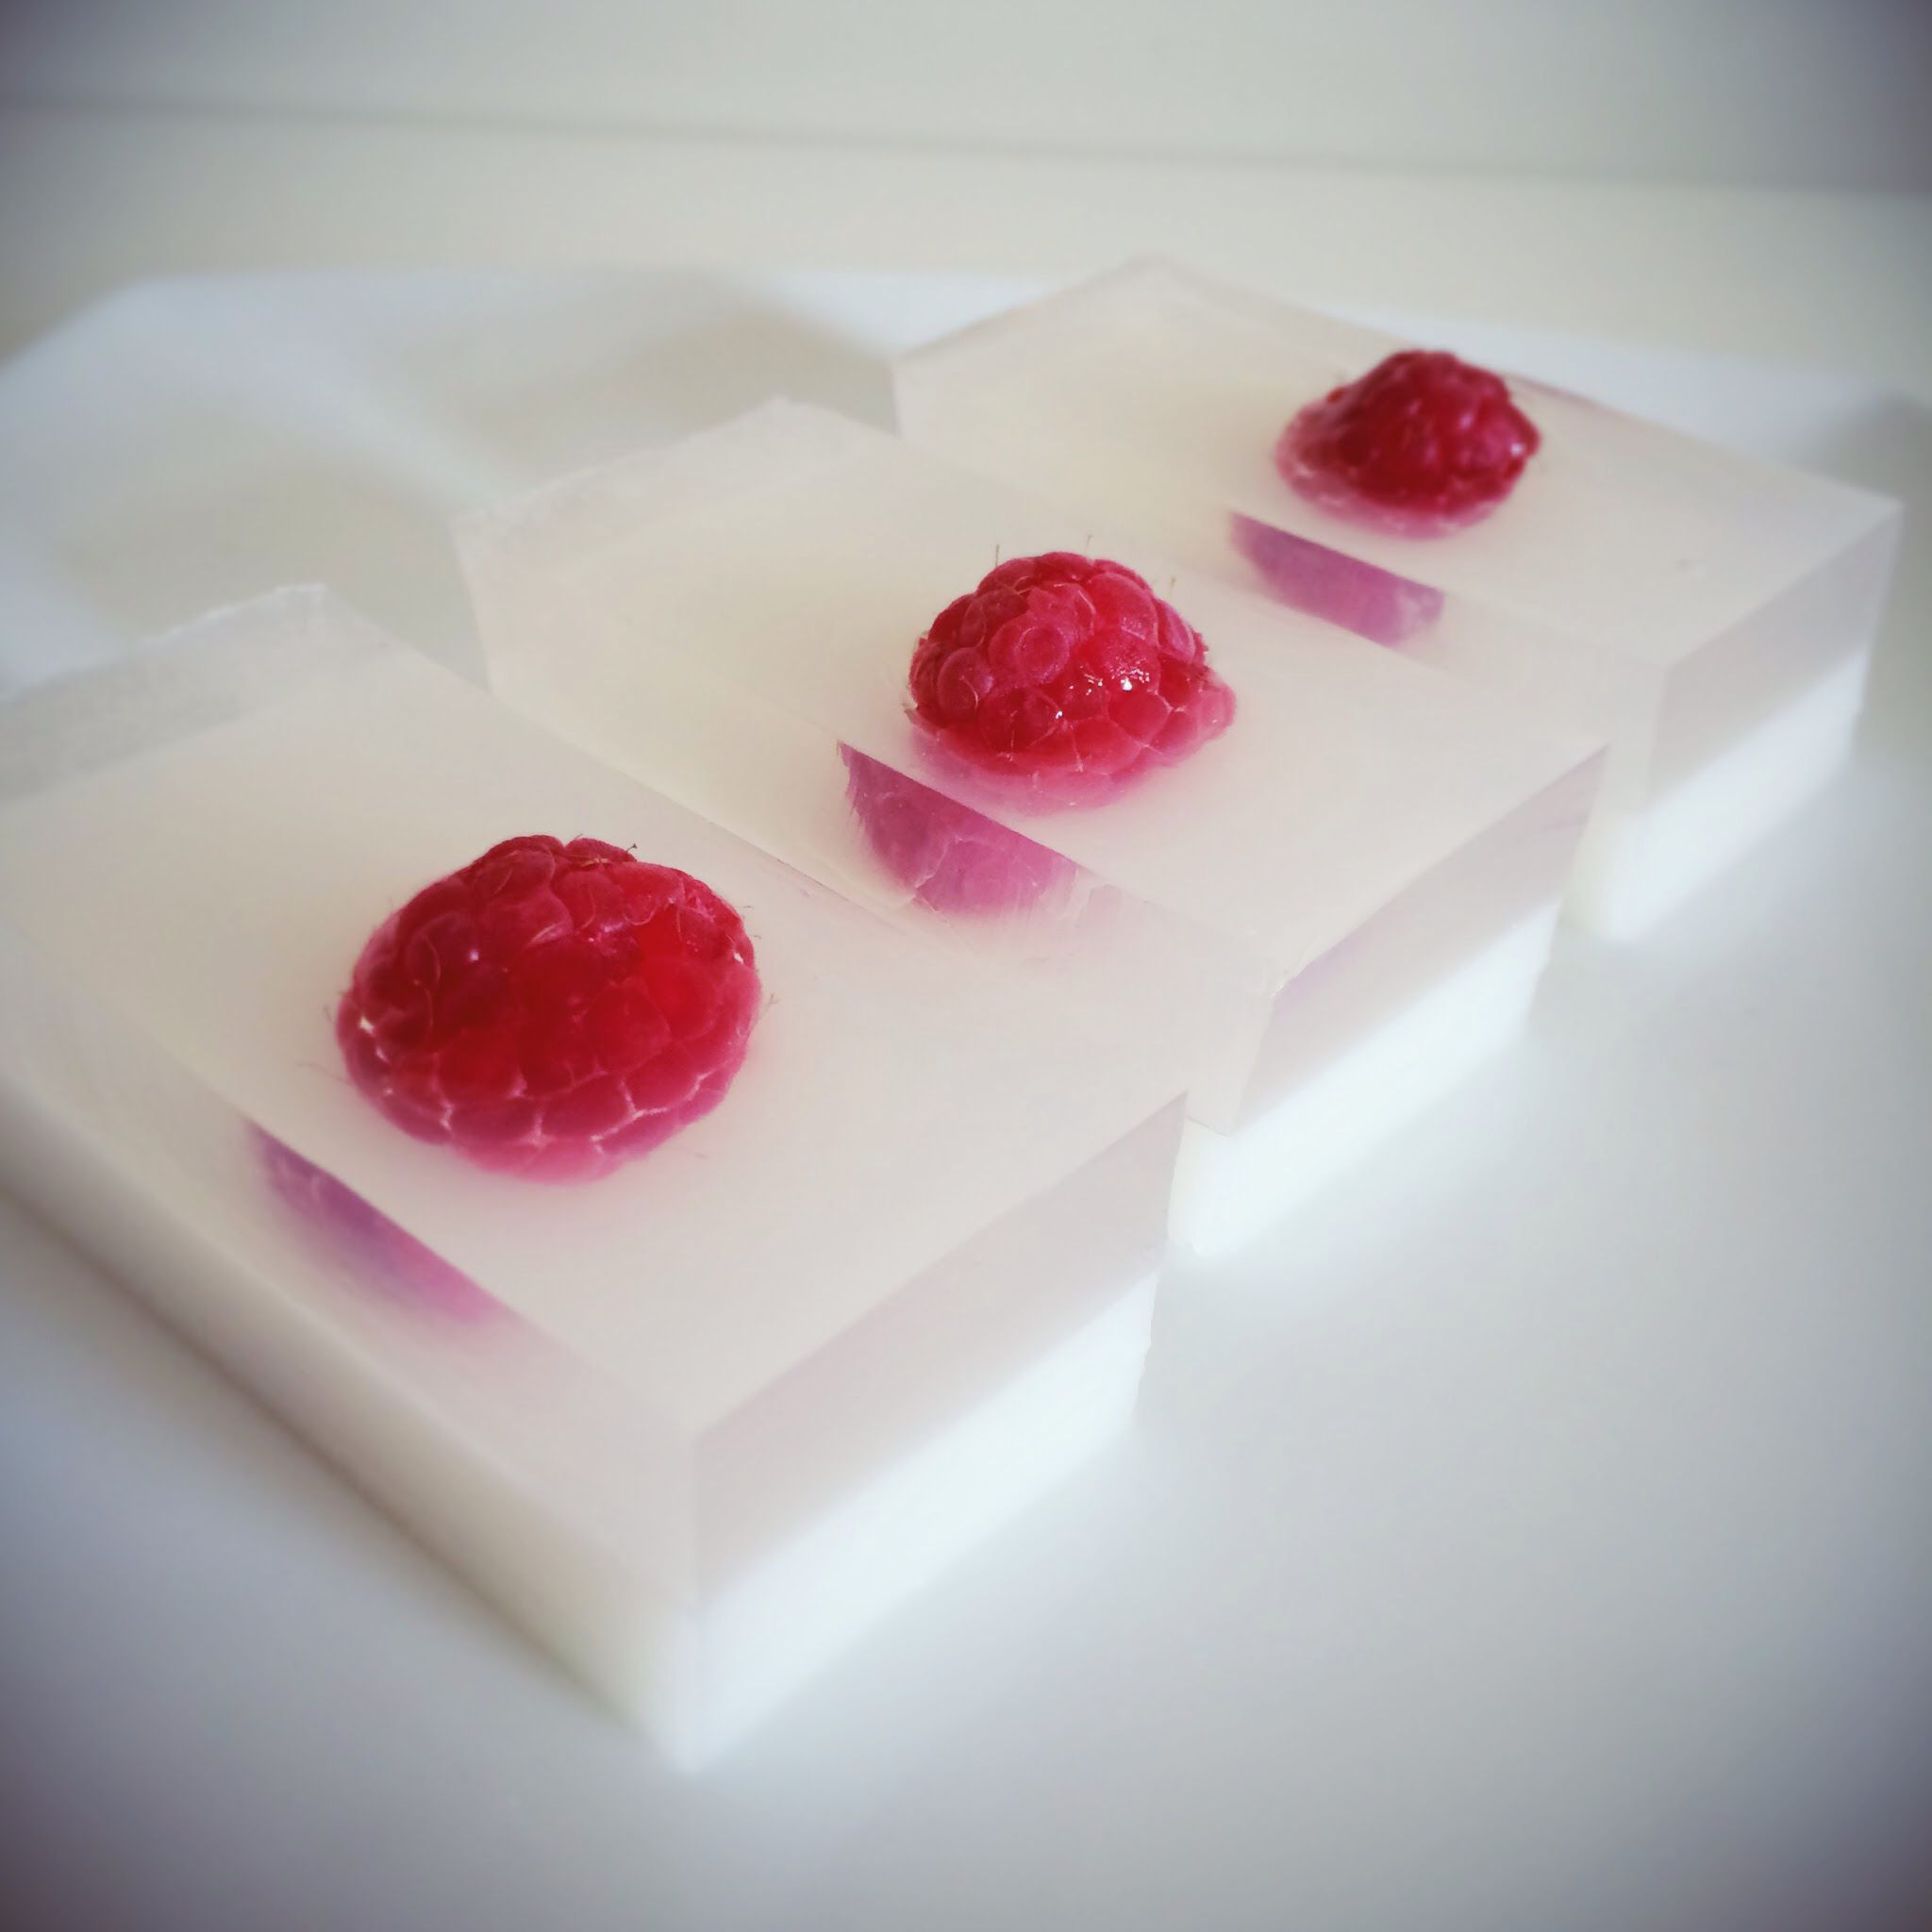 Coconut Agar Agar dessert | Food : jams, sauces, jellies, | Pinterest